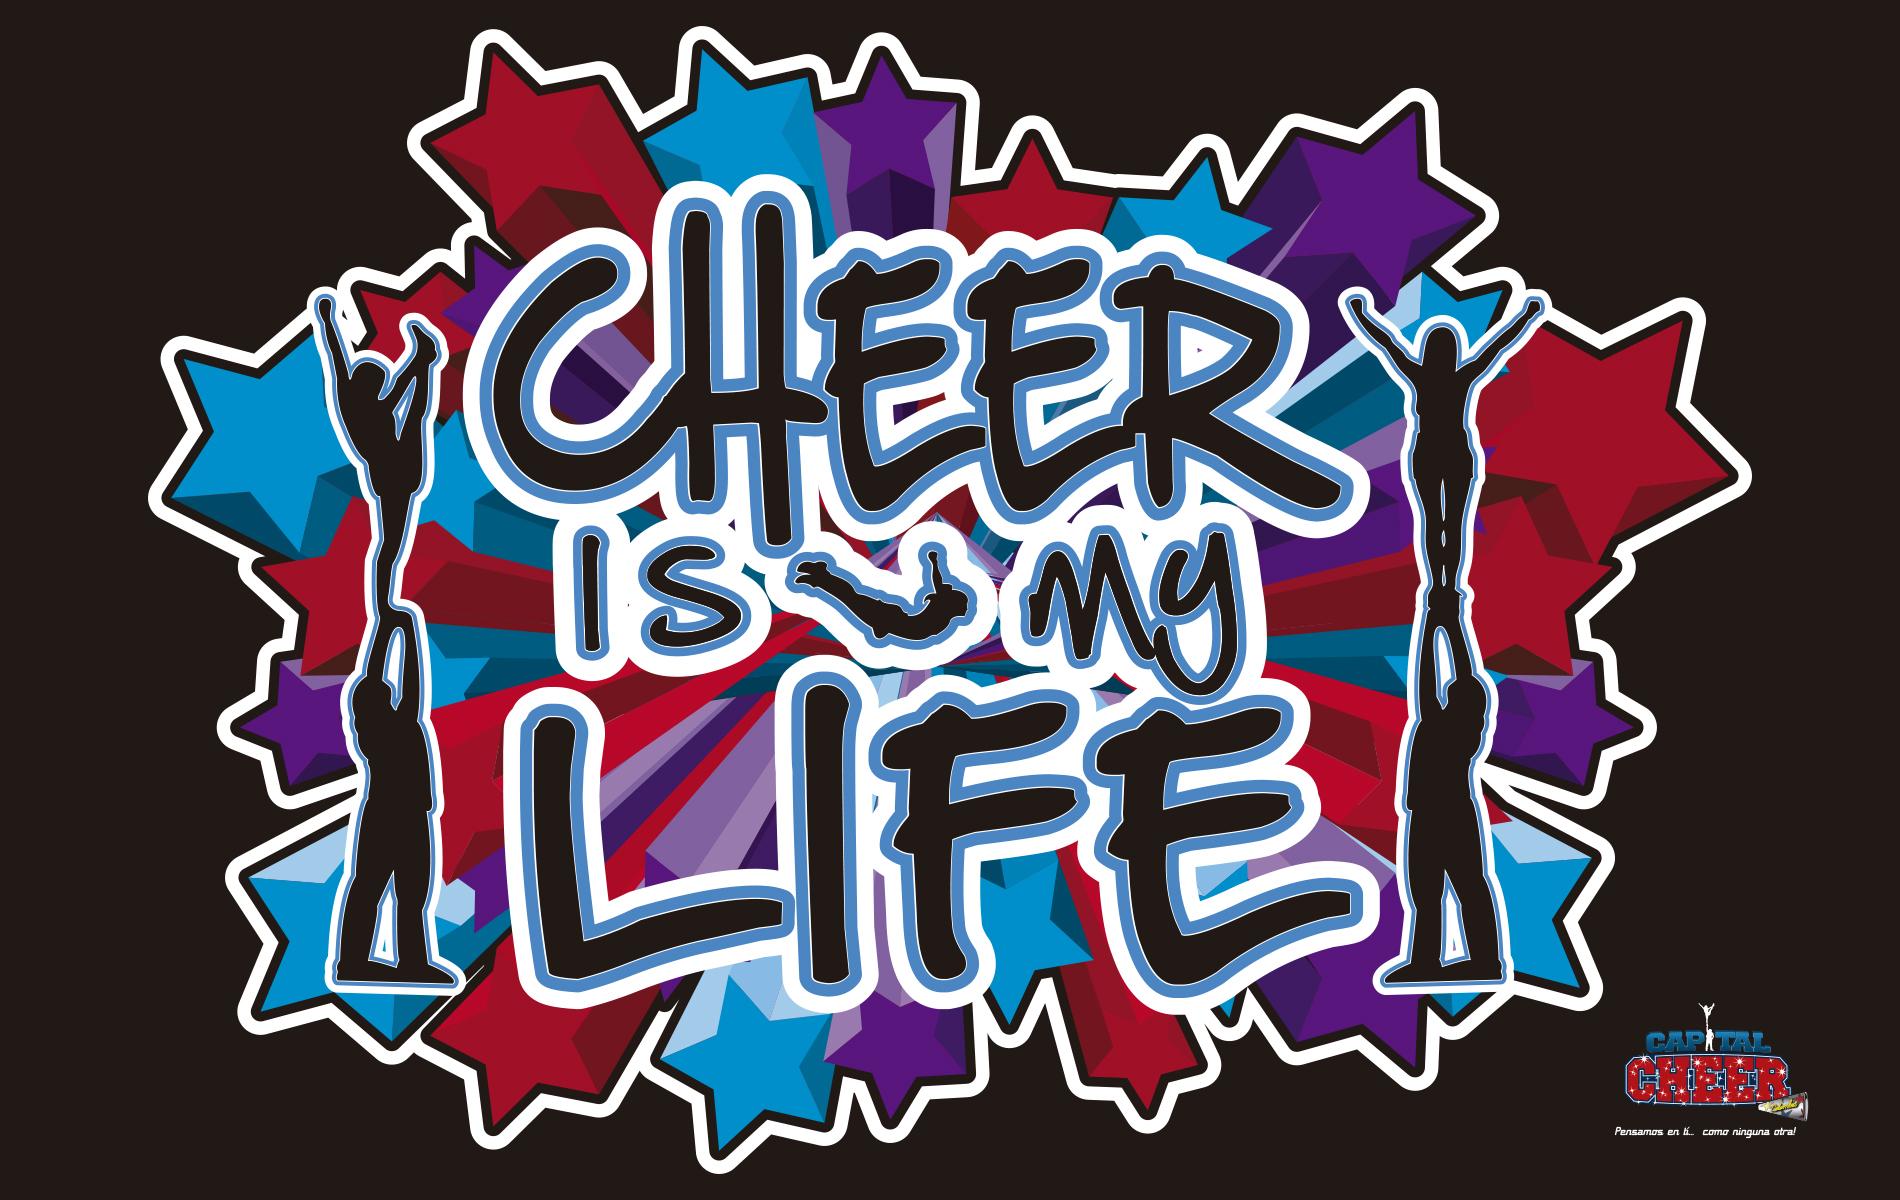 cheerleading wallpapers wallpapersafari cheerleading victory cheerleading vector